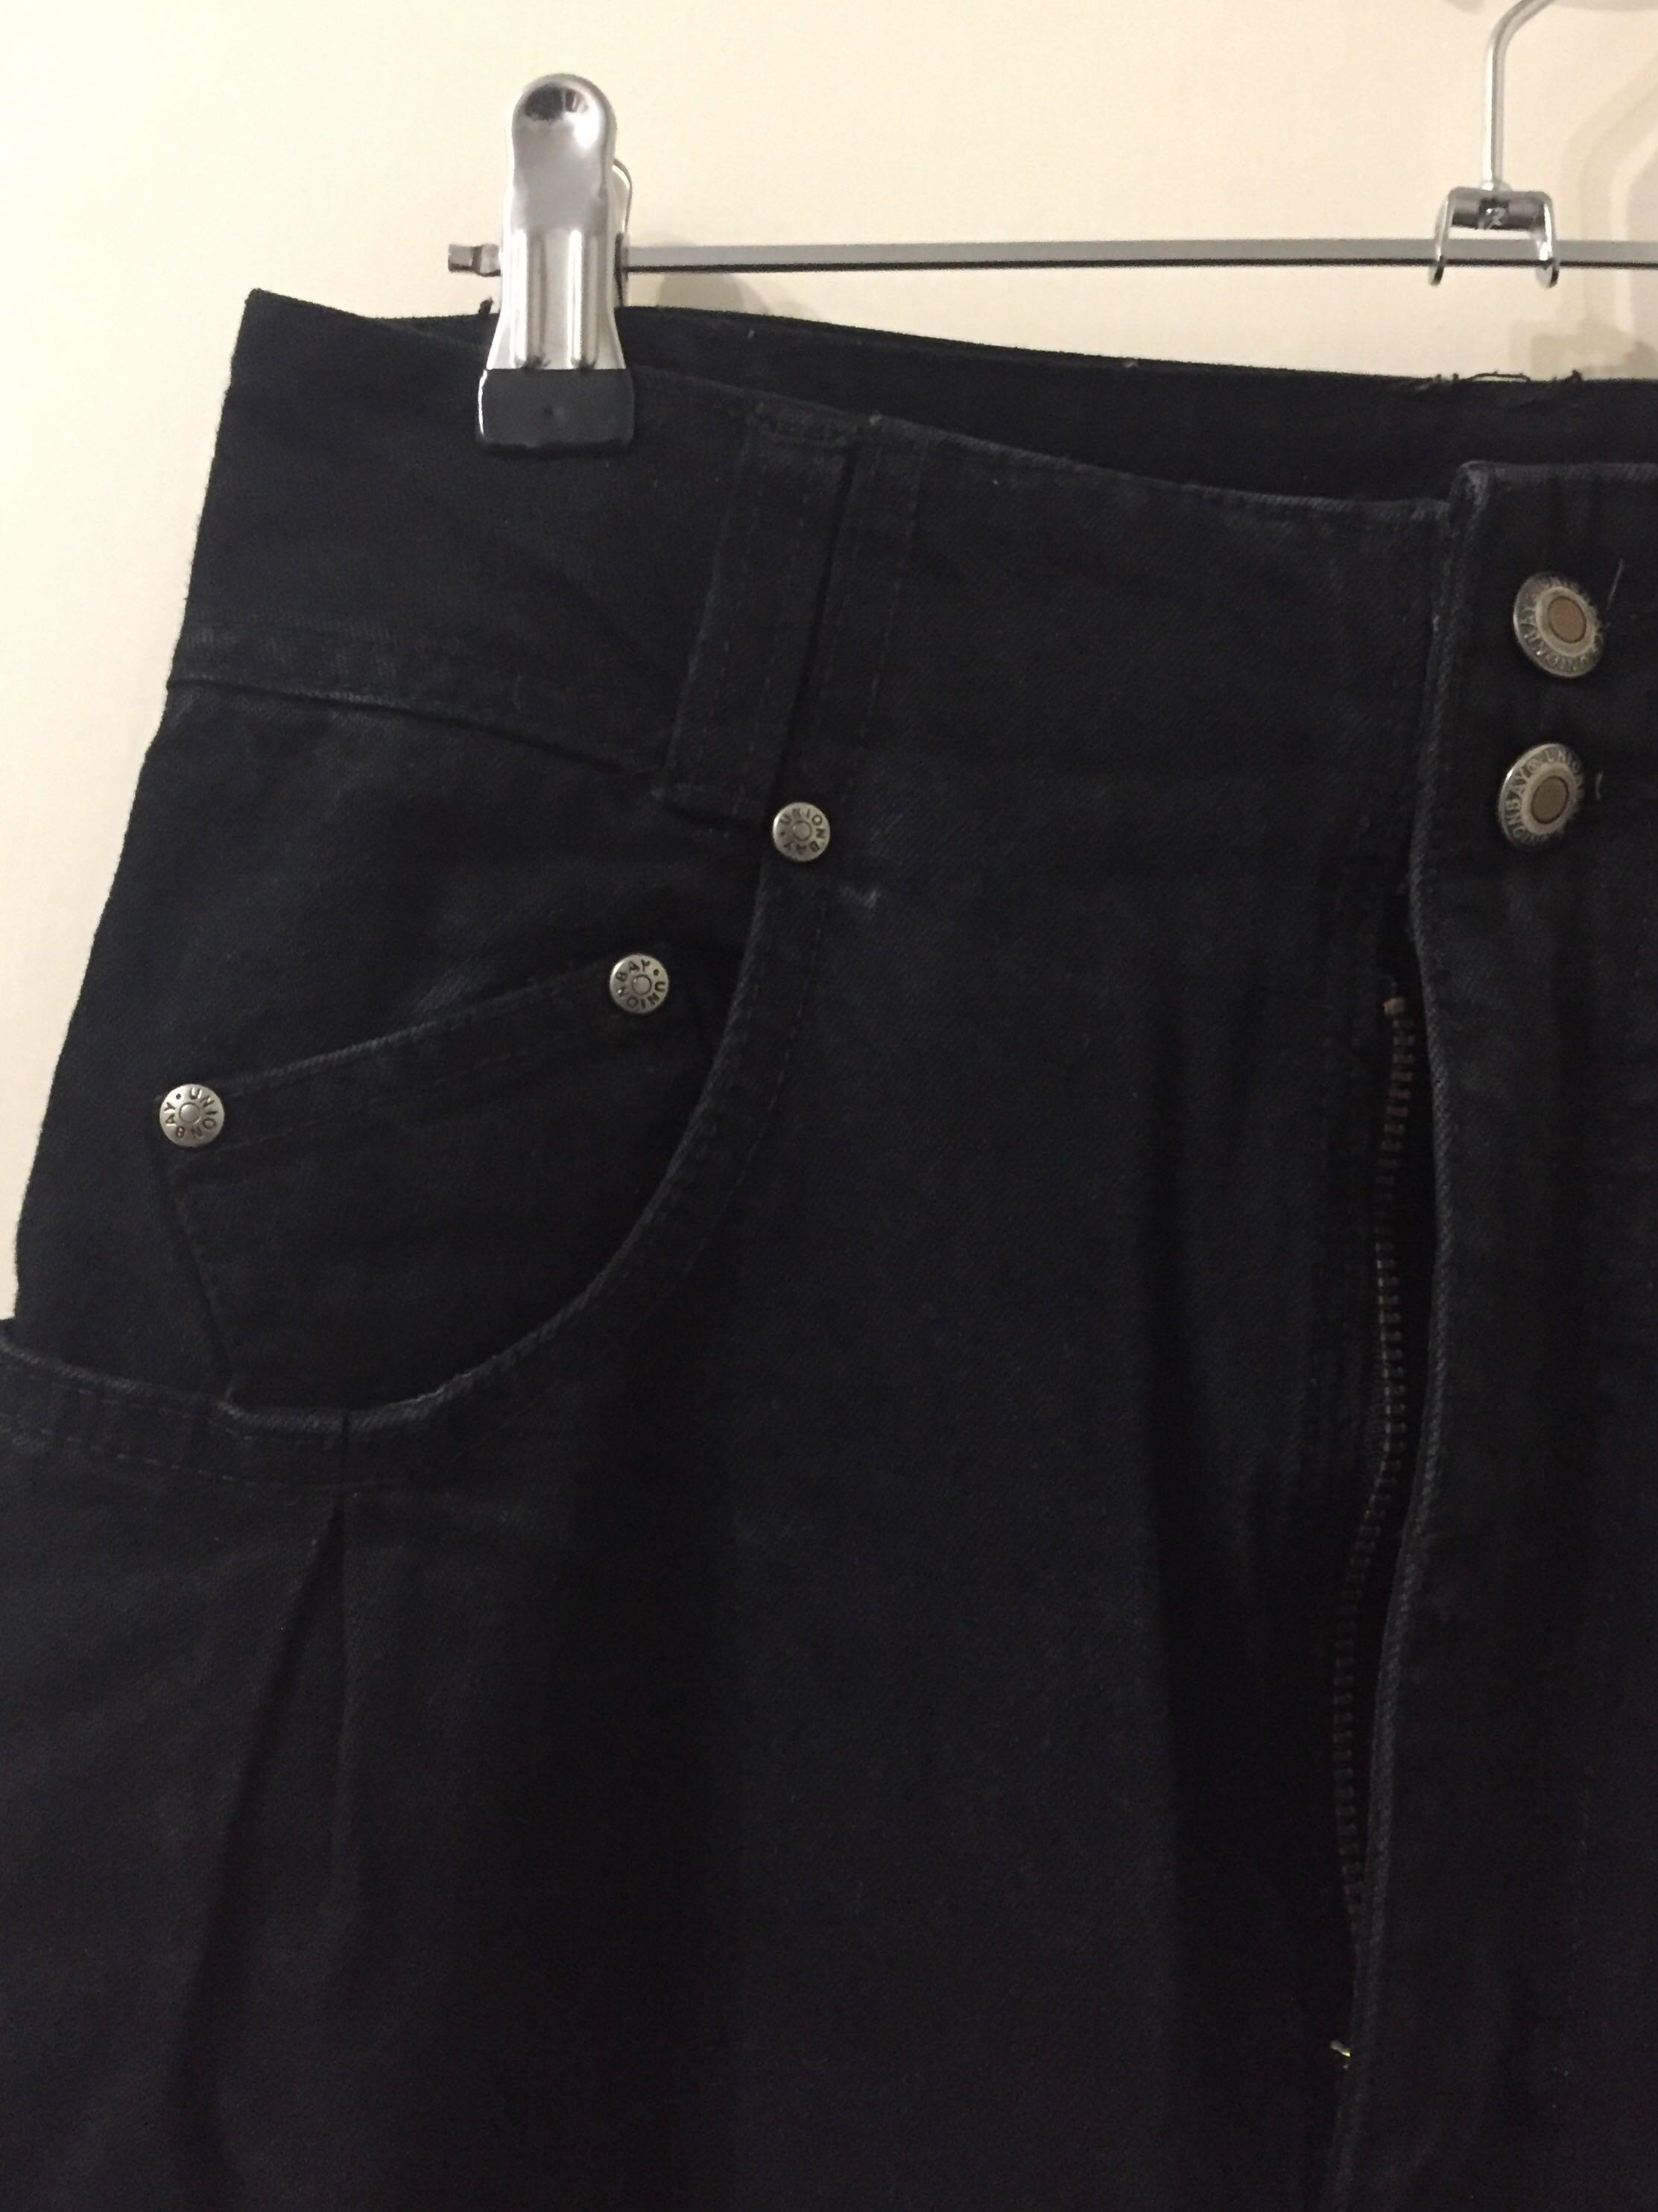 Unionbay Denim & Co Super High Waisted Vintage Black Jeans